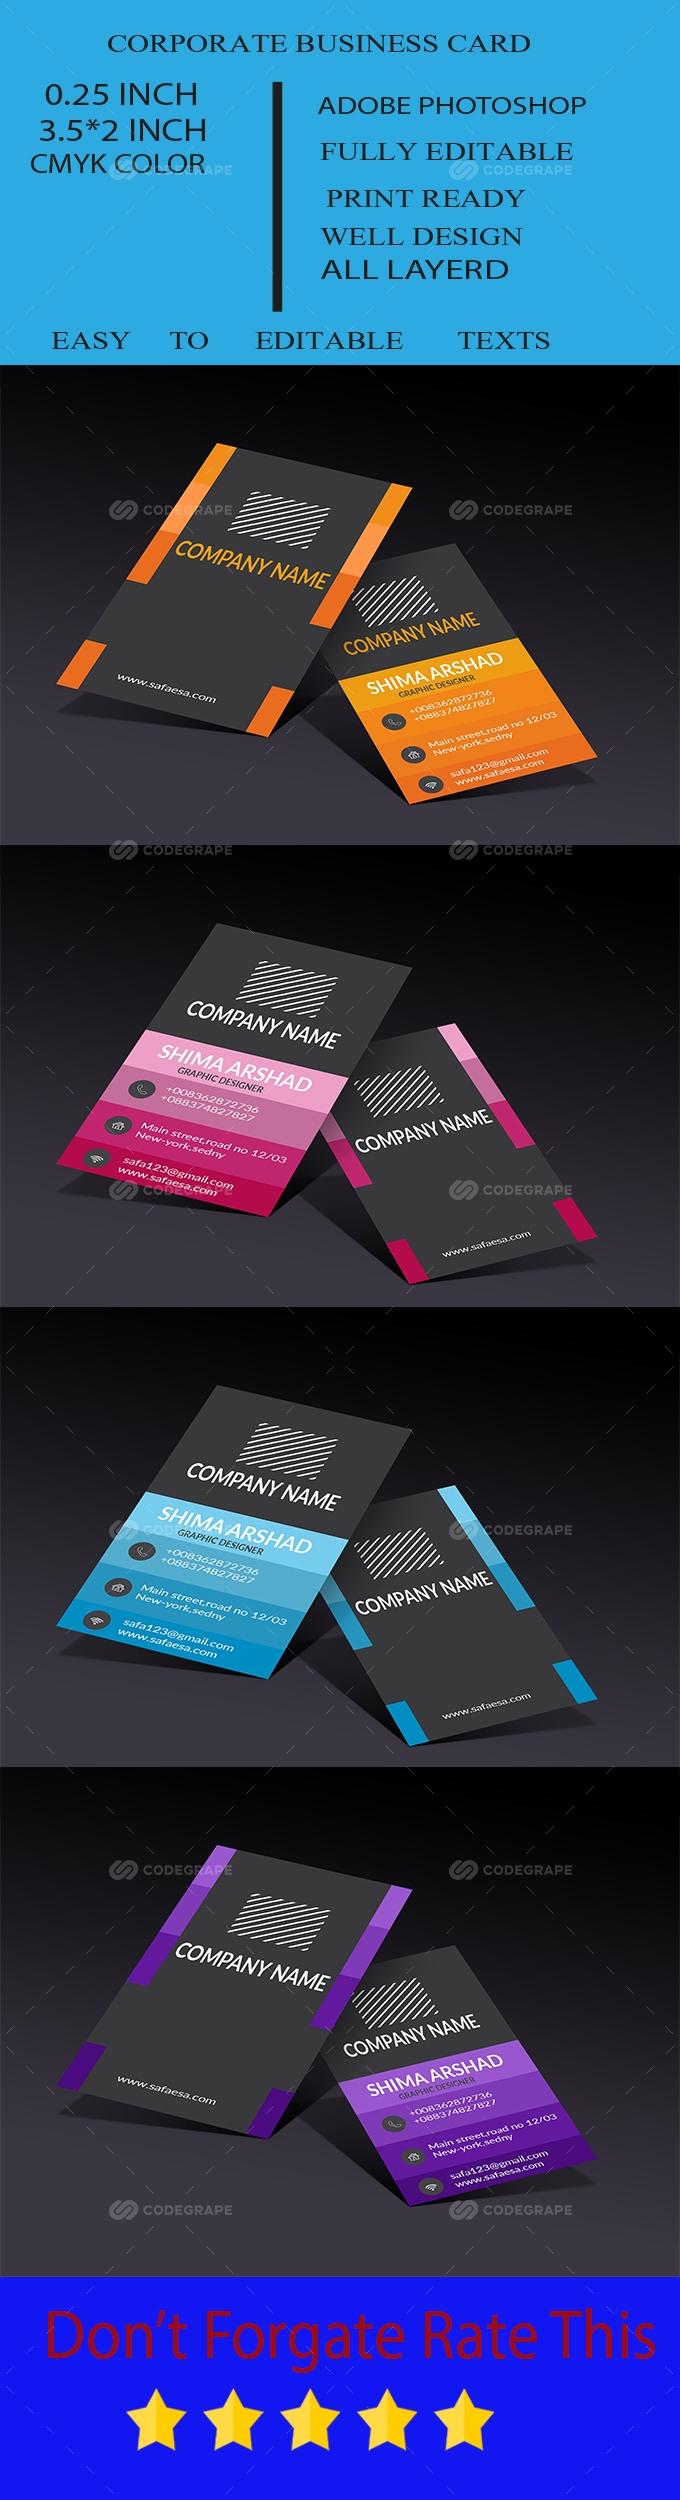 Business Card Adobe PhotoshopBusiness CardsLipsense CardsVisit CardsCarte De VisiteName Cards